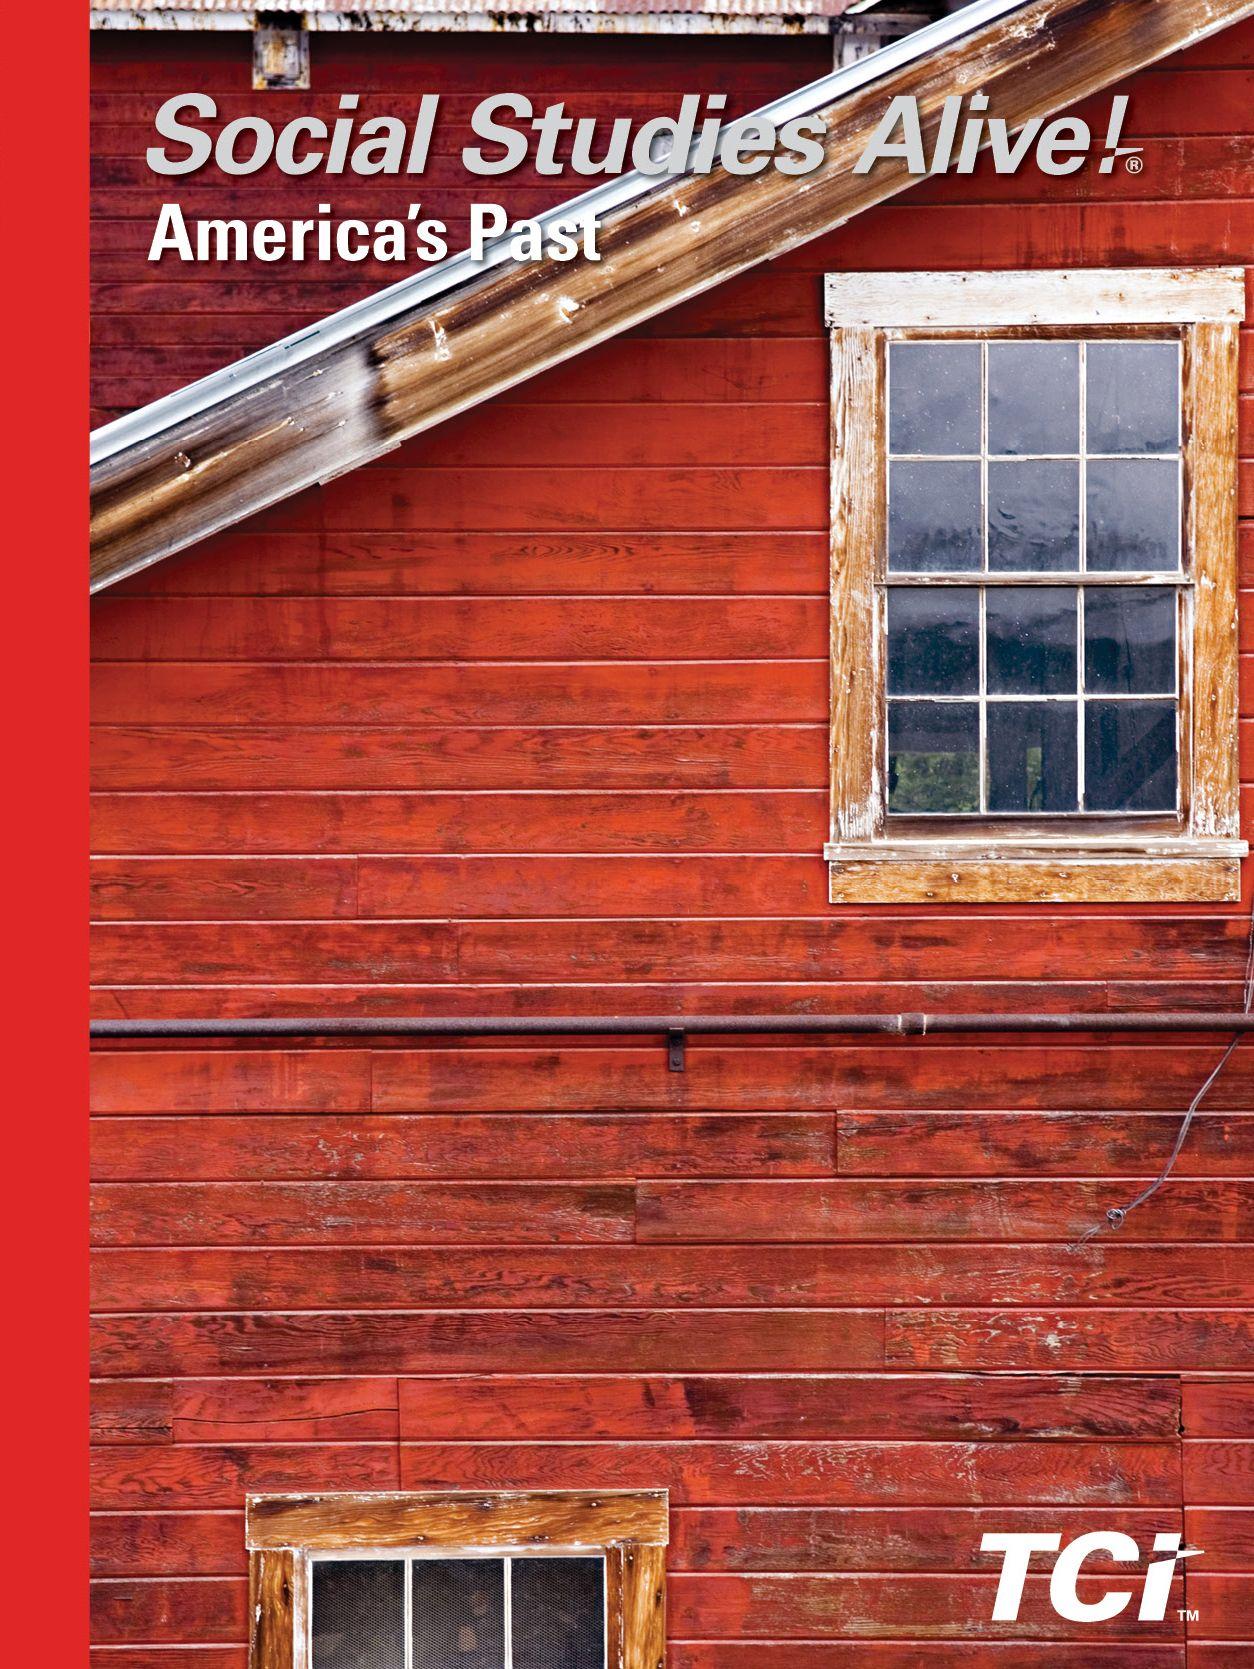 Social Studies Alive! America's Past